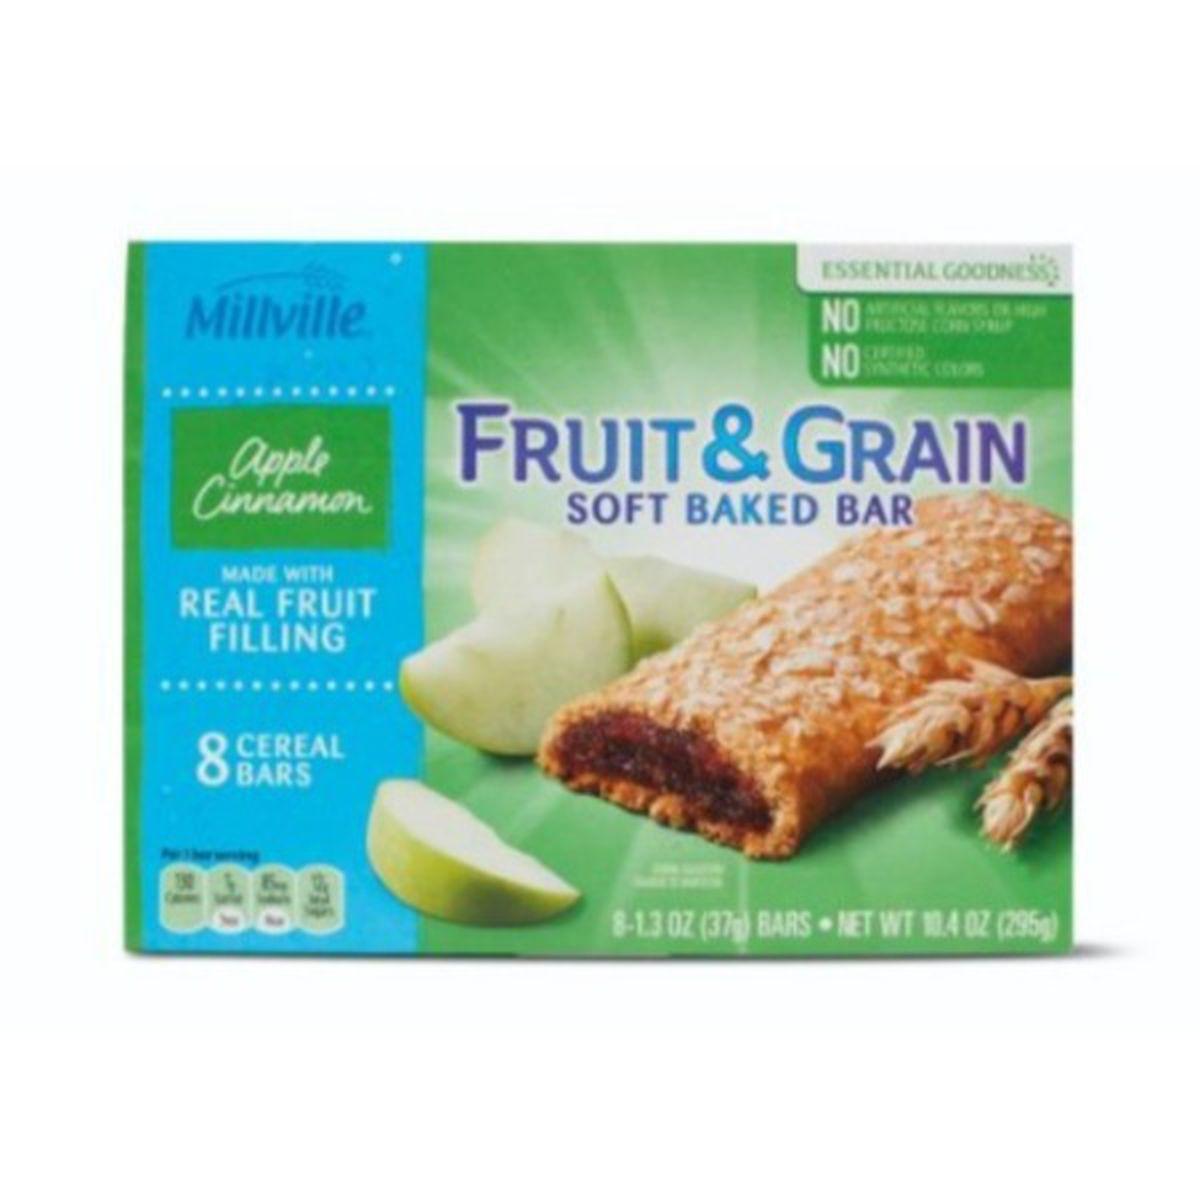 Fruit and Grain Cereal Bars - Apple Cinnamon